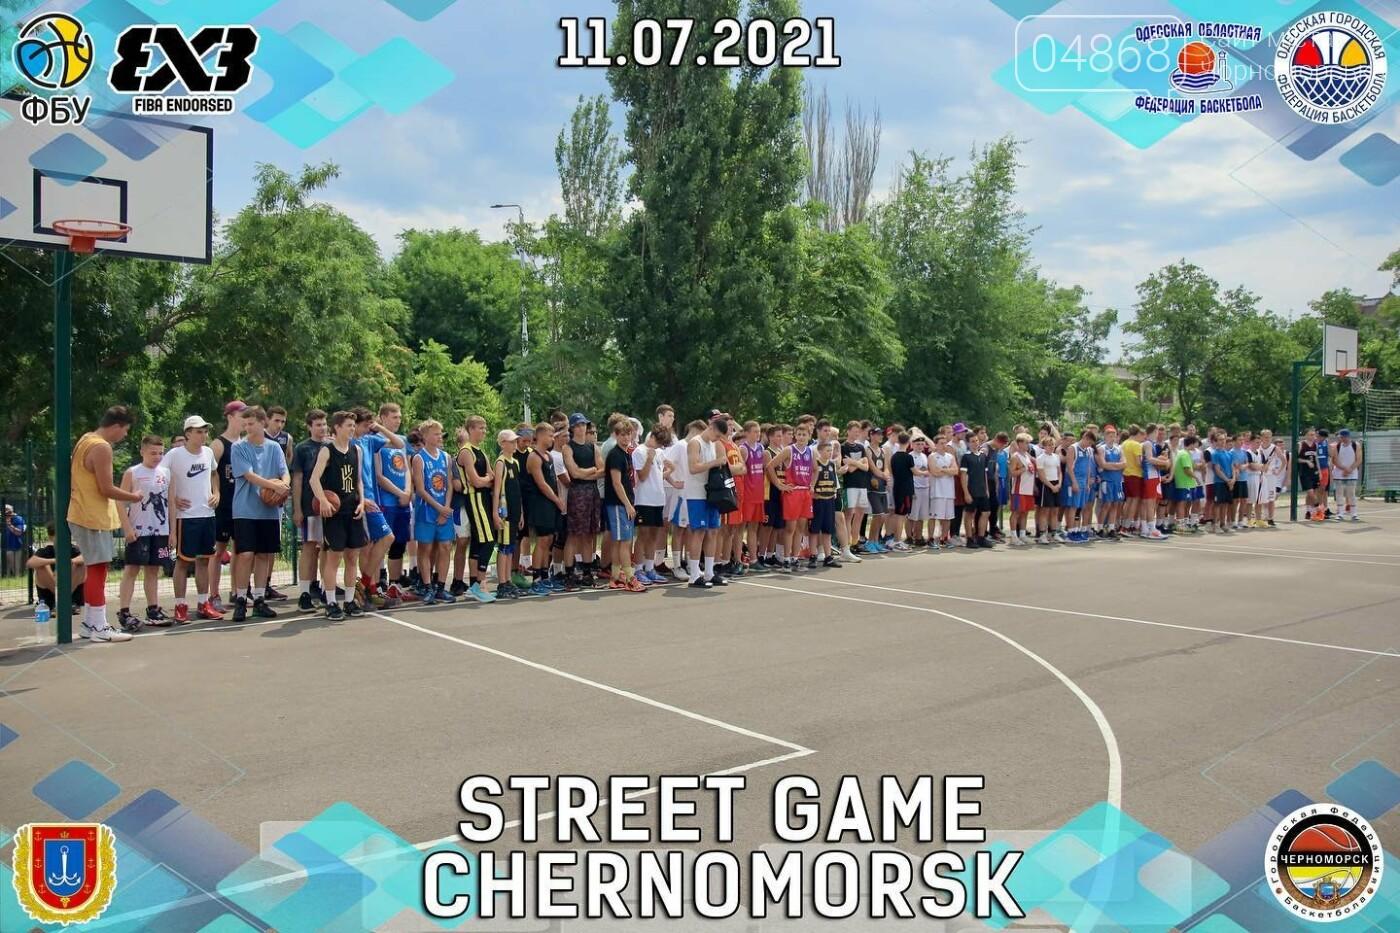 В Черноморске прошёл турнир по баскетболу «Street Game Chernomorsk», фото-7